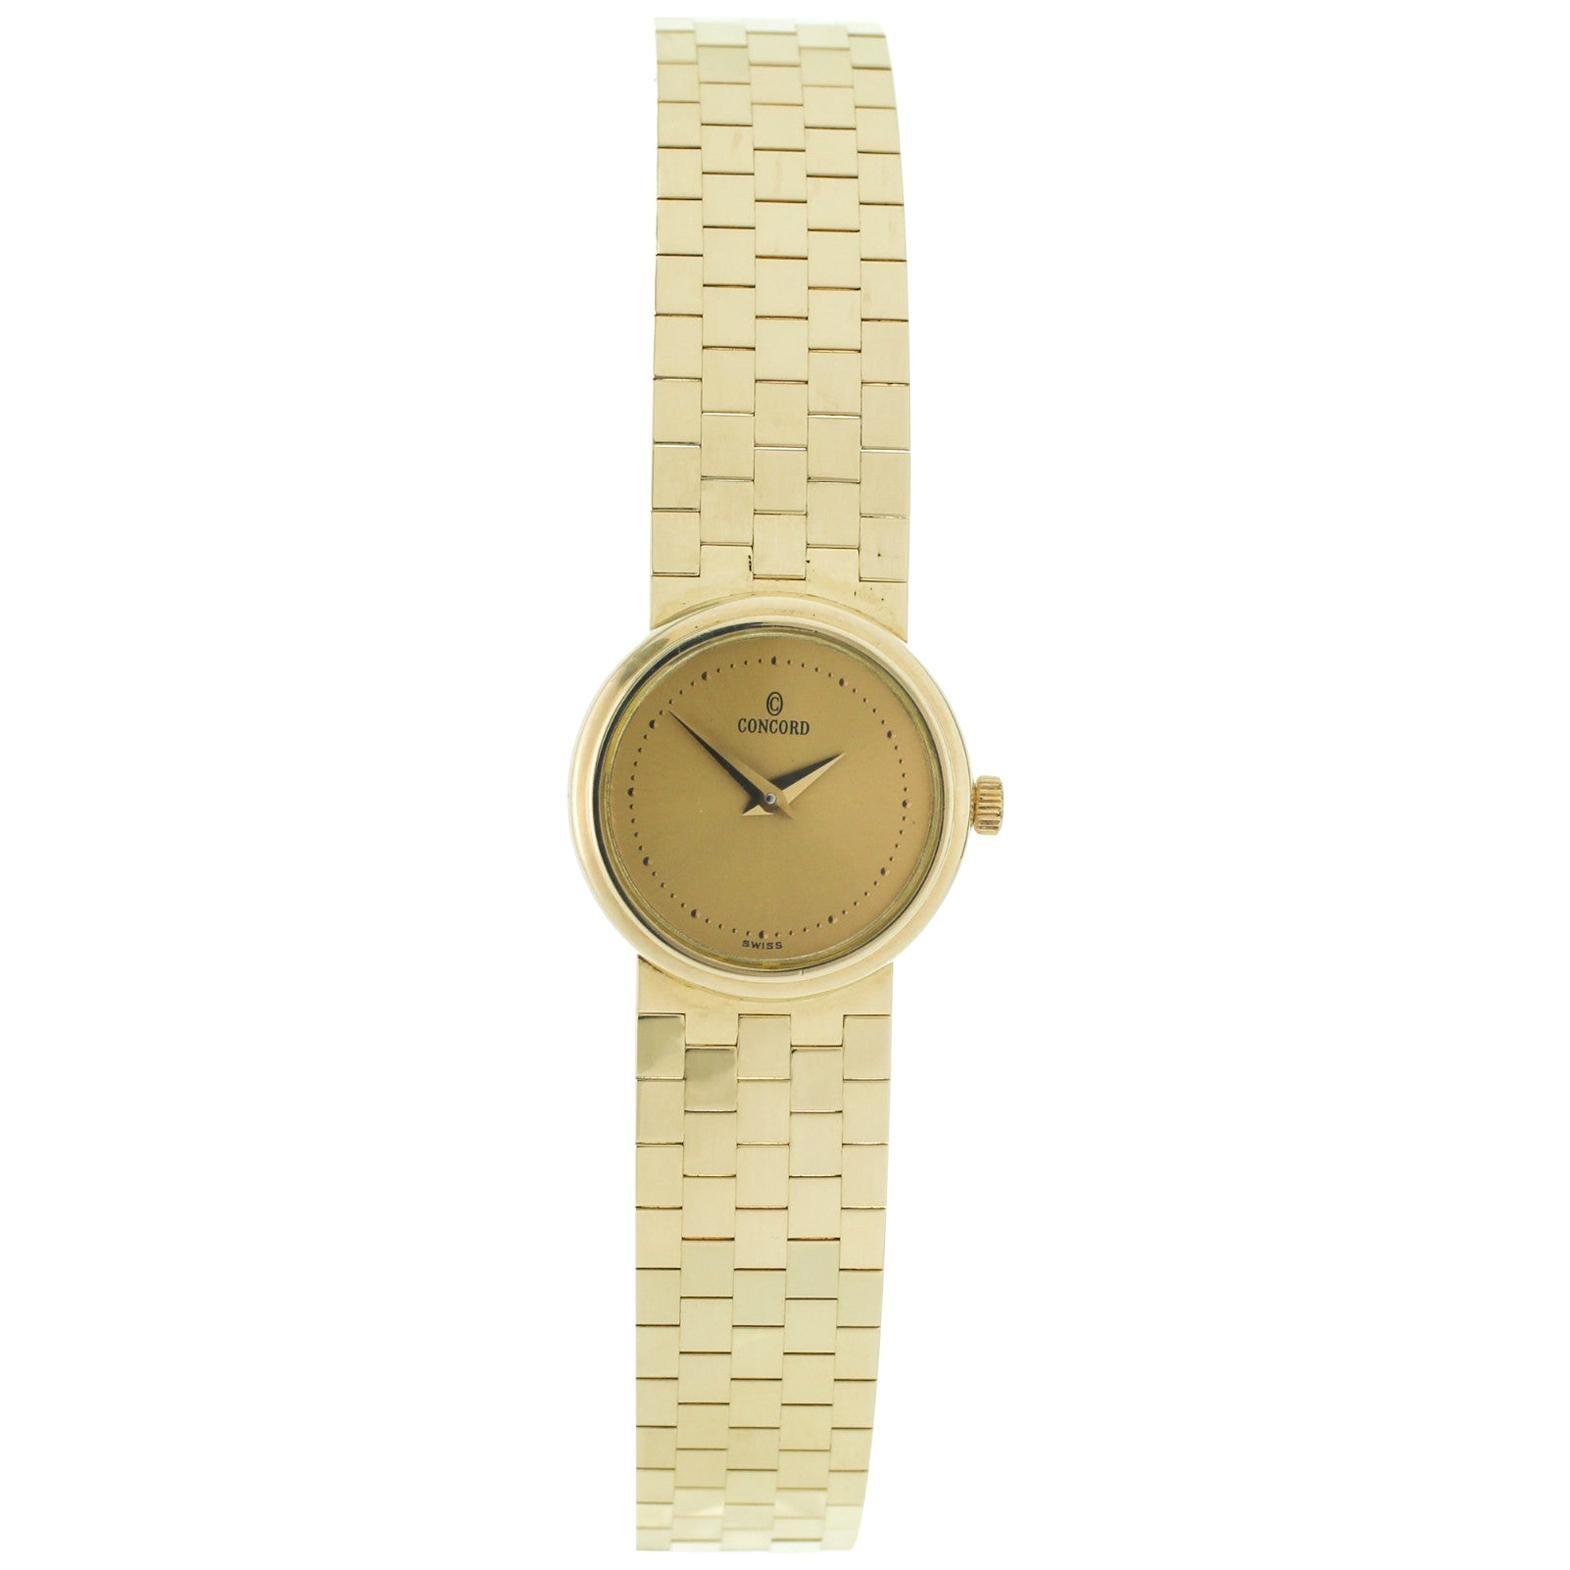 Concord C100 14 Karat Yellow Gold Quartz Ladies Watch 22262256